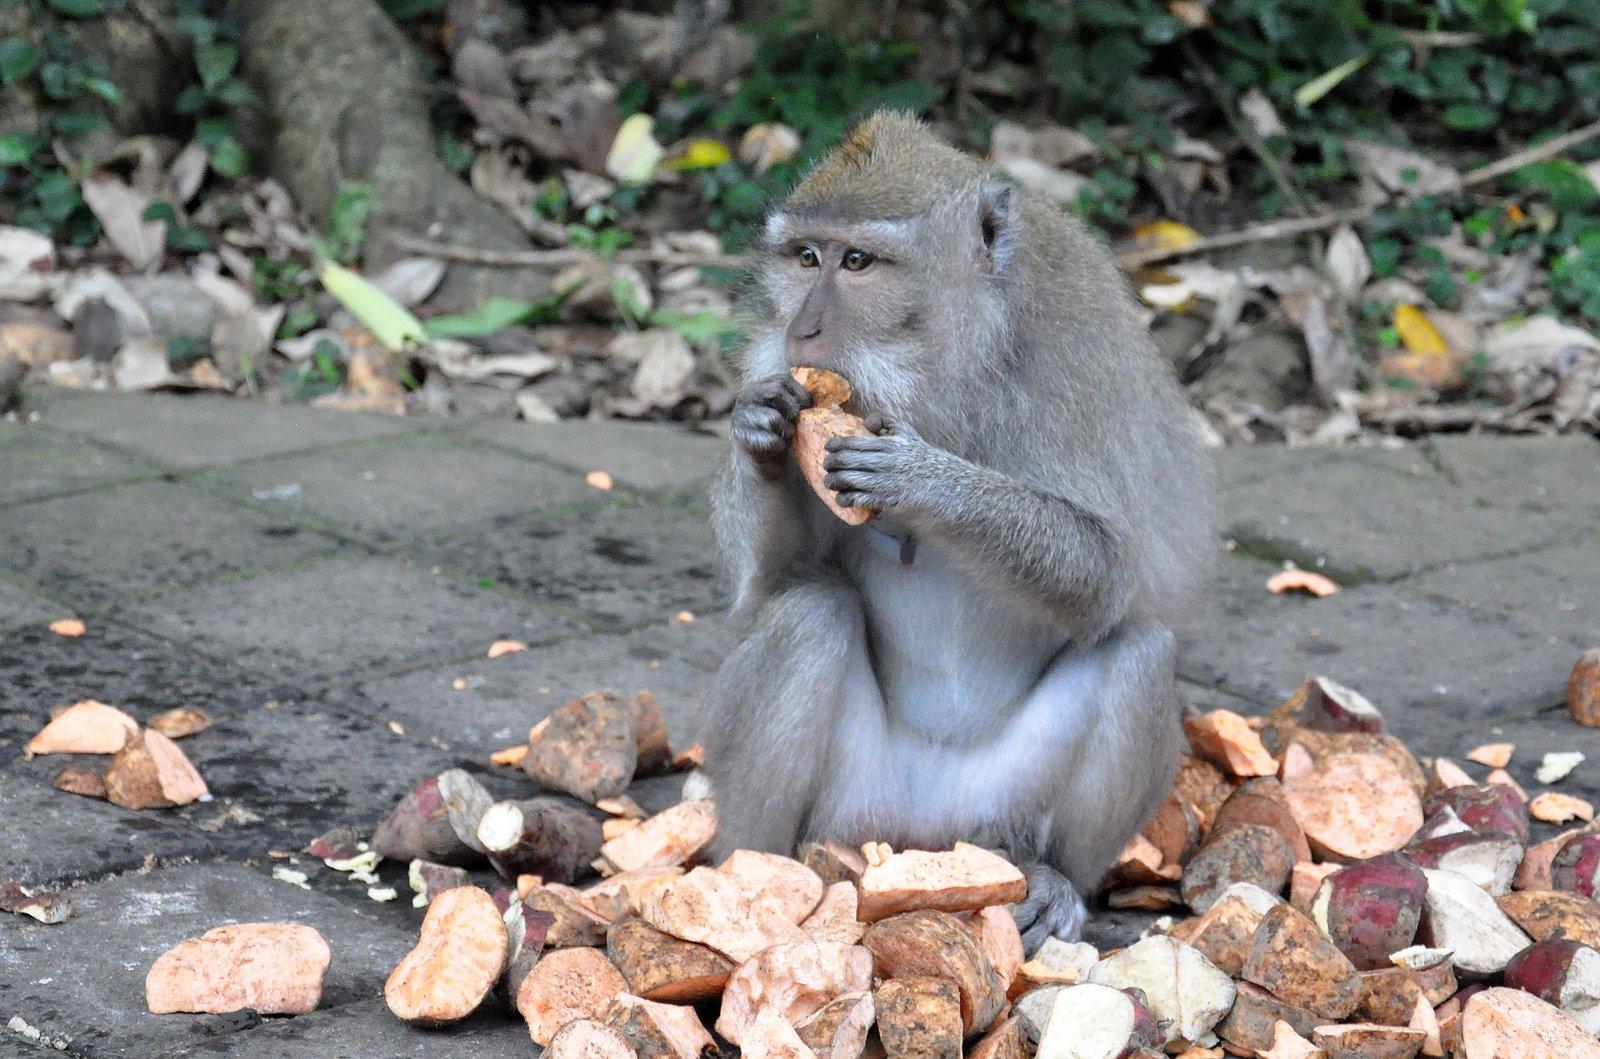 bosque-monos-ubud-bali